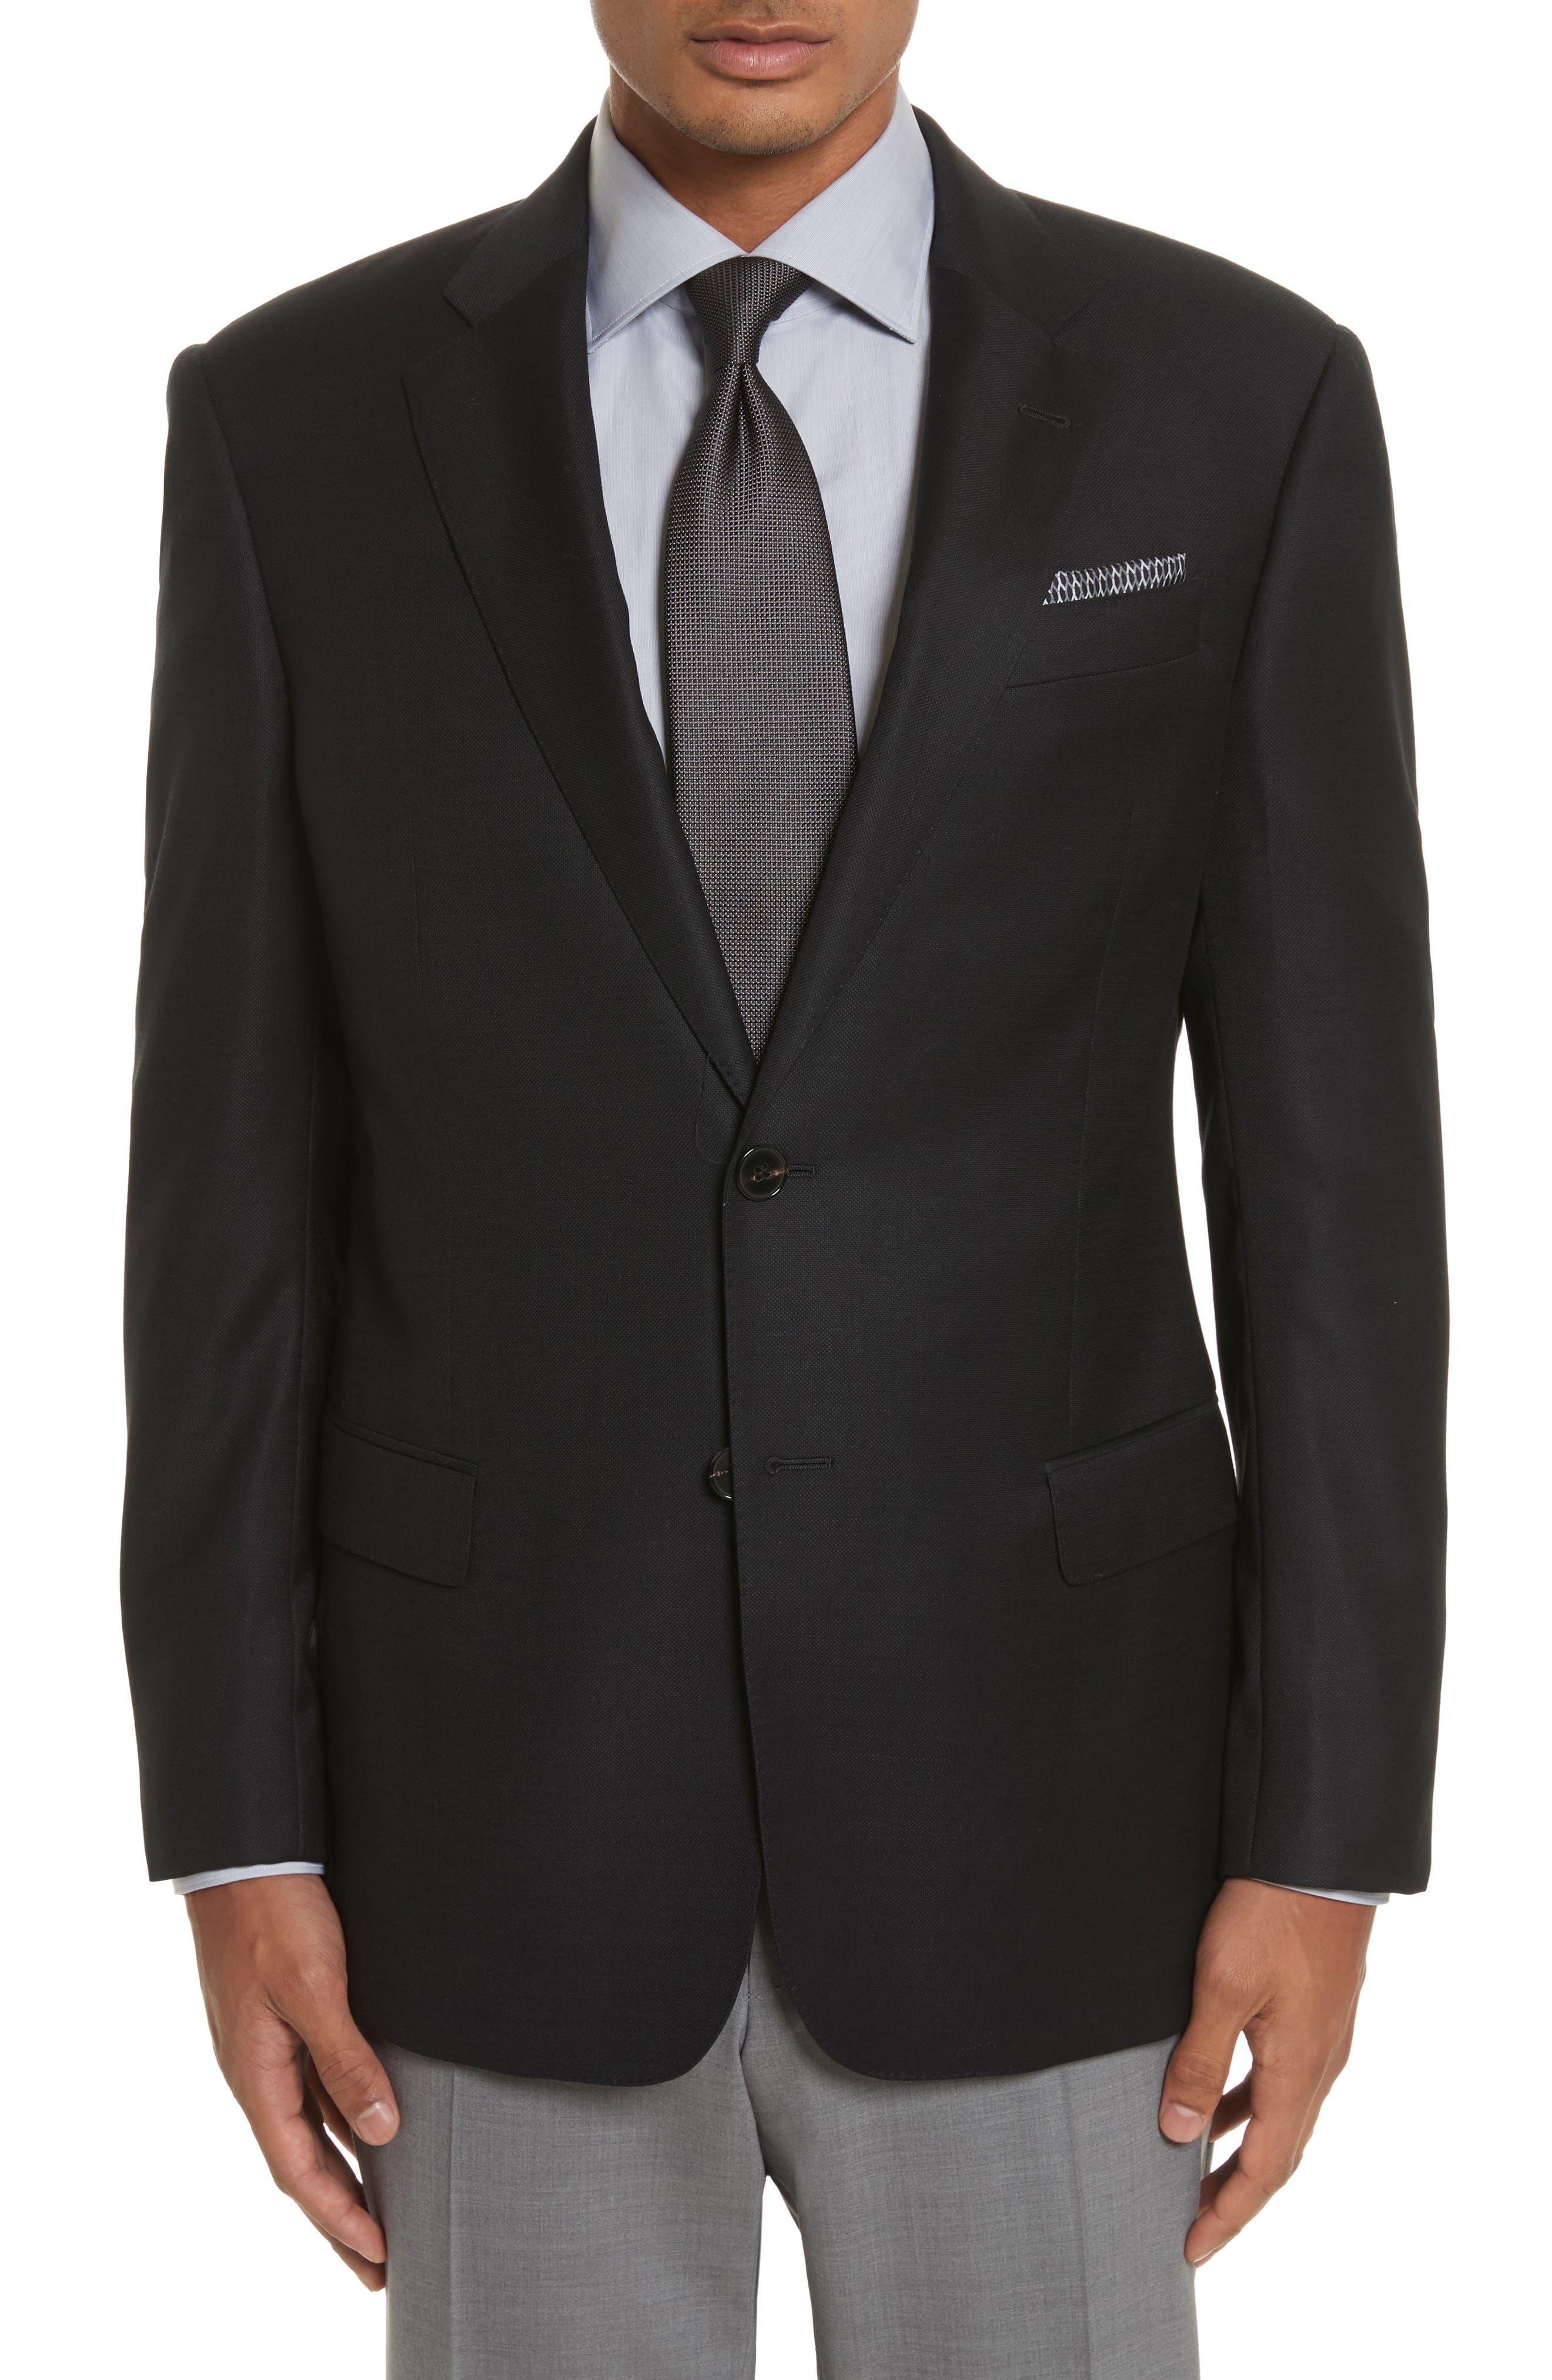 G-Line Trim Fit Wool Blazer,                         Main,                         color, Black